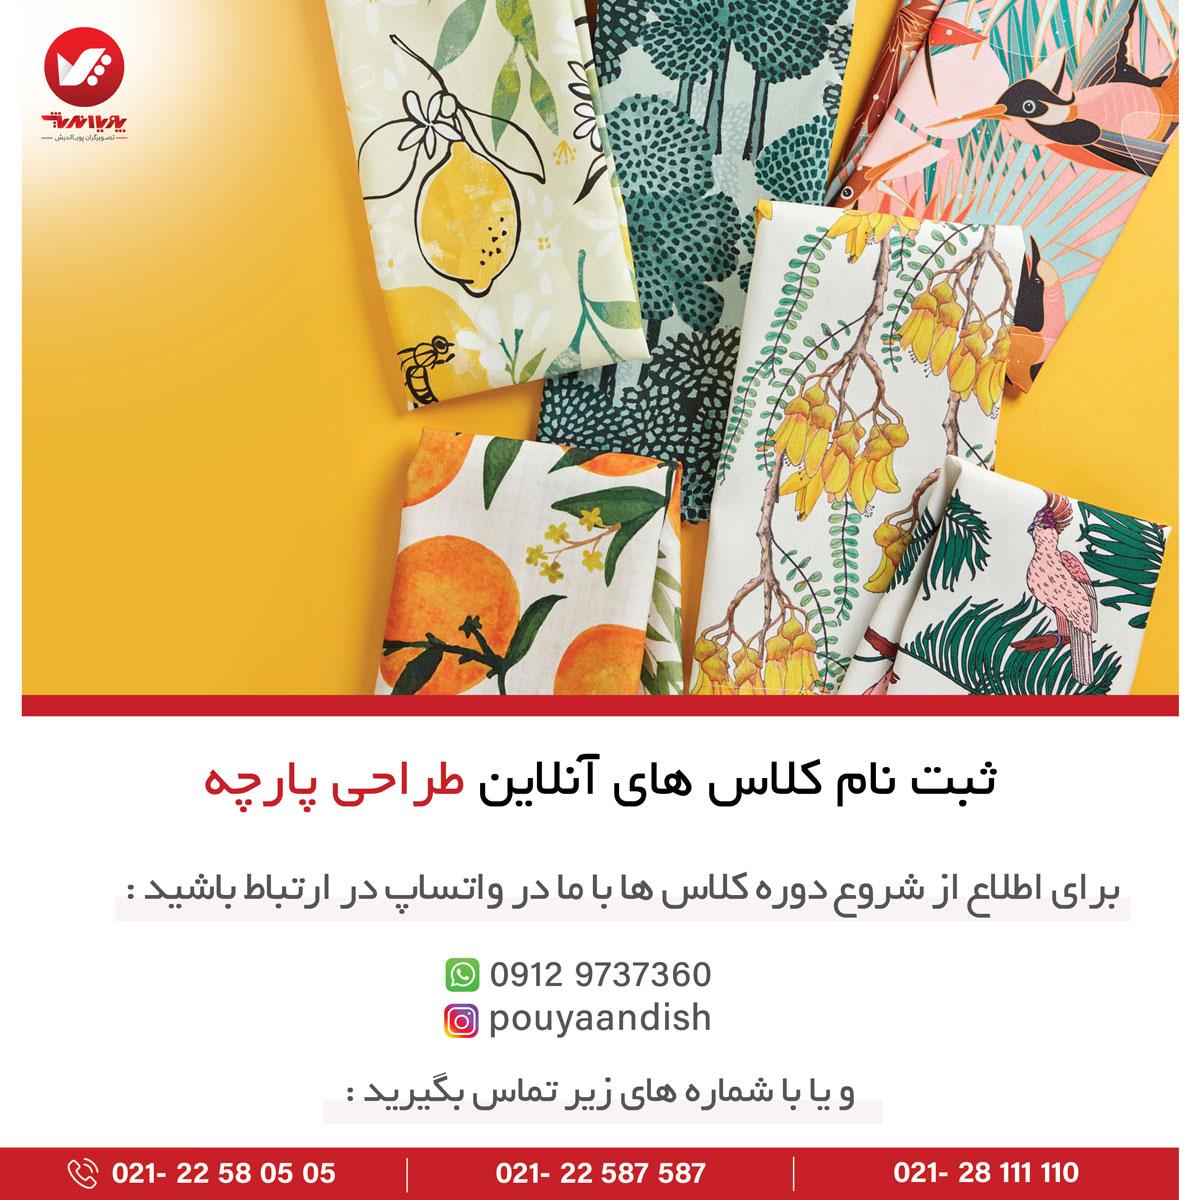 tarahi parche dasti sabtenam - طراحی پارچه